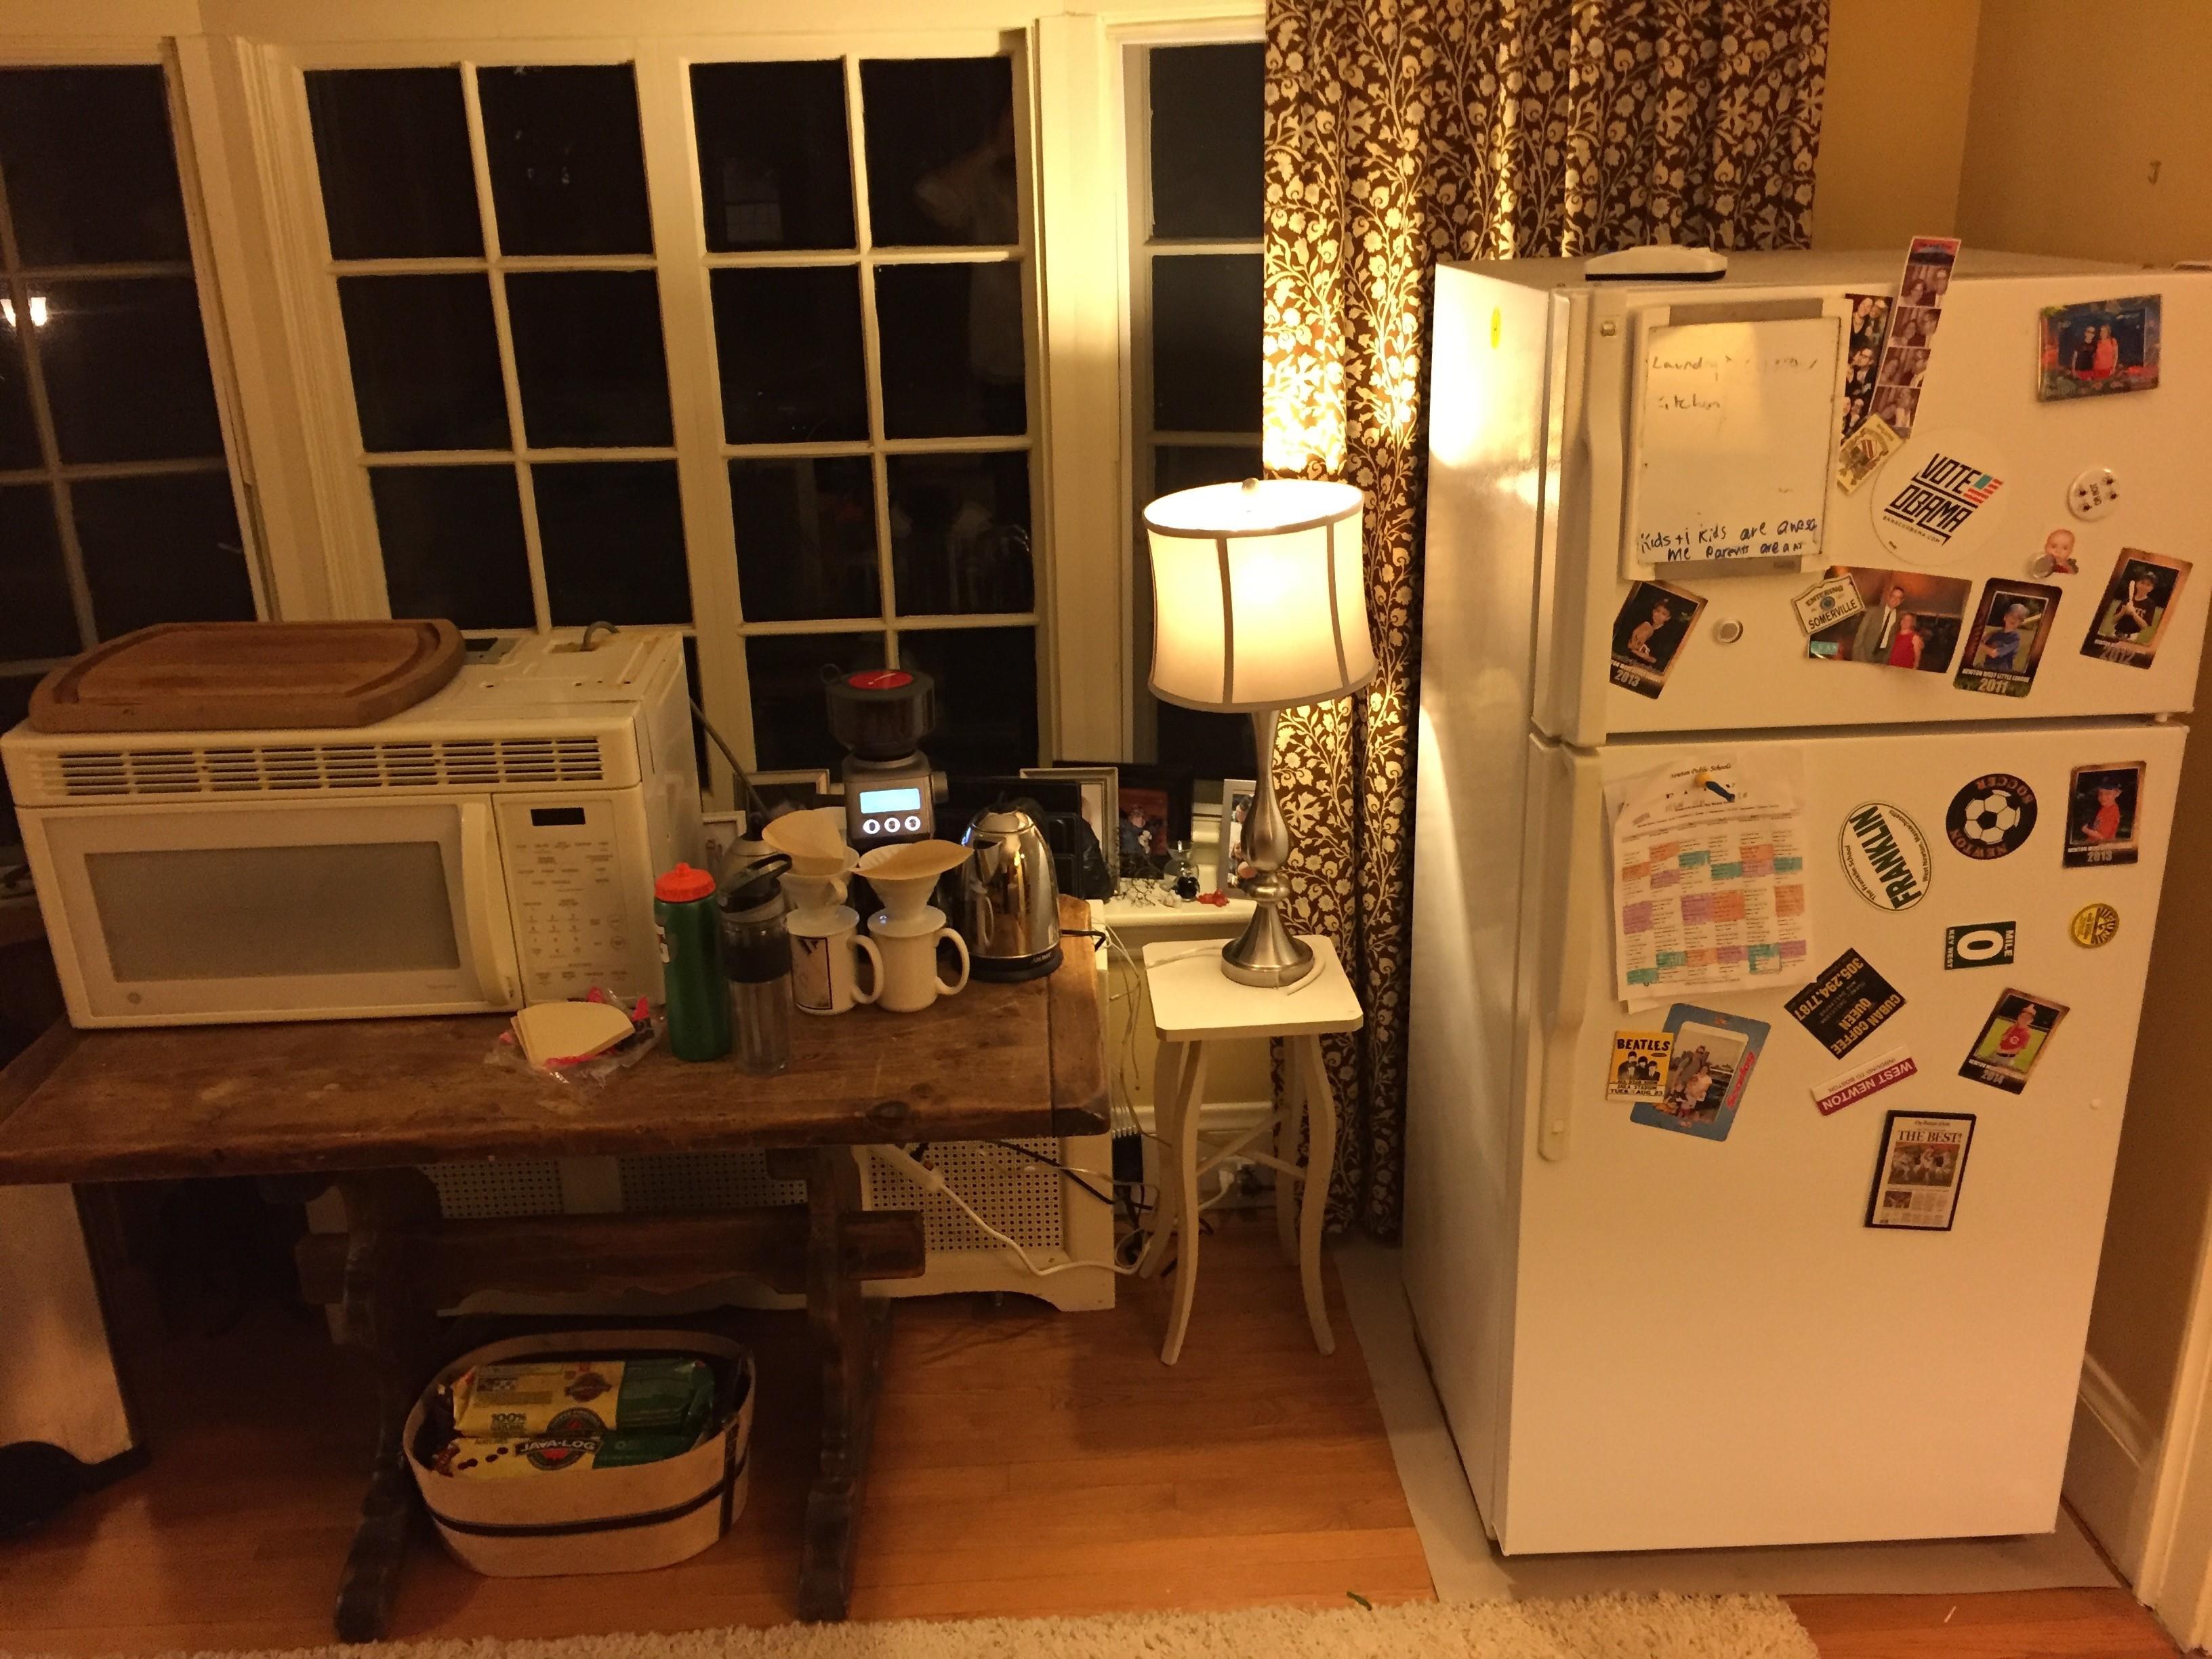 10 30 2015 Guest Blog Ed S Kitchen Renovation Randlettpark Com